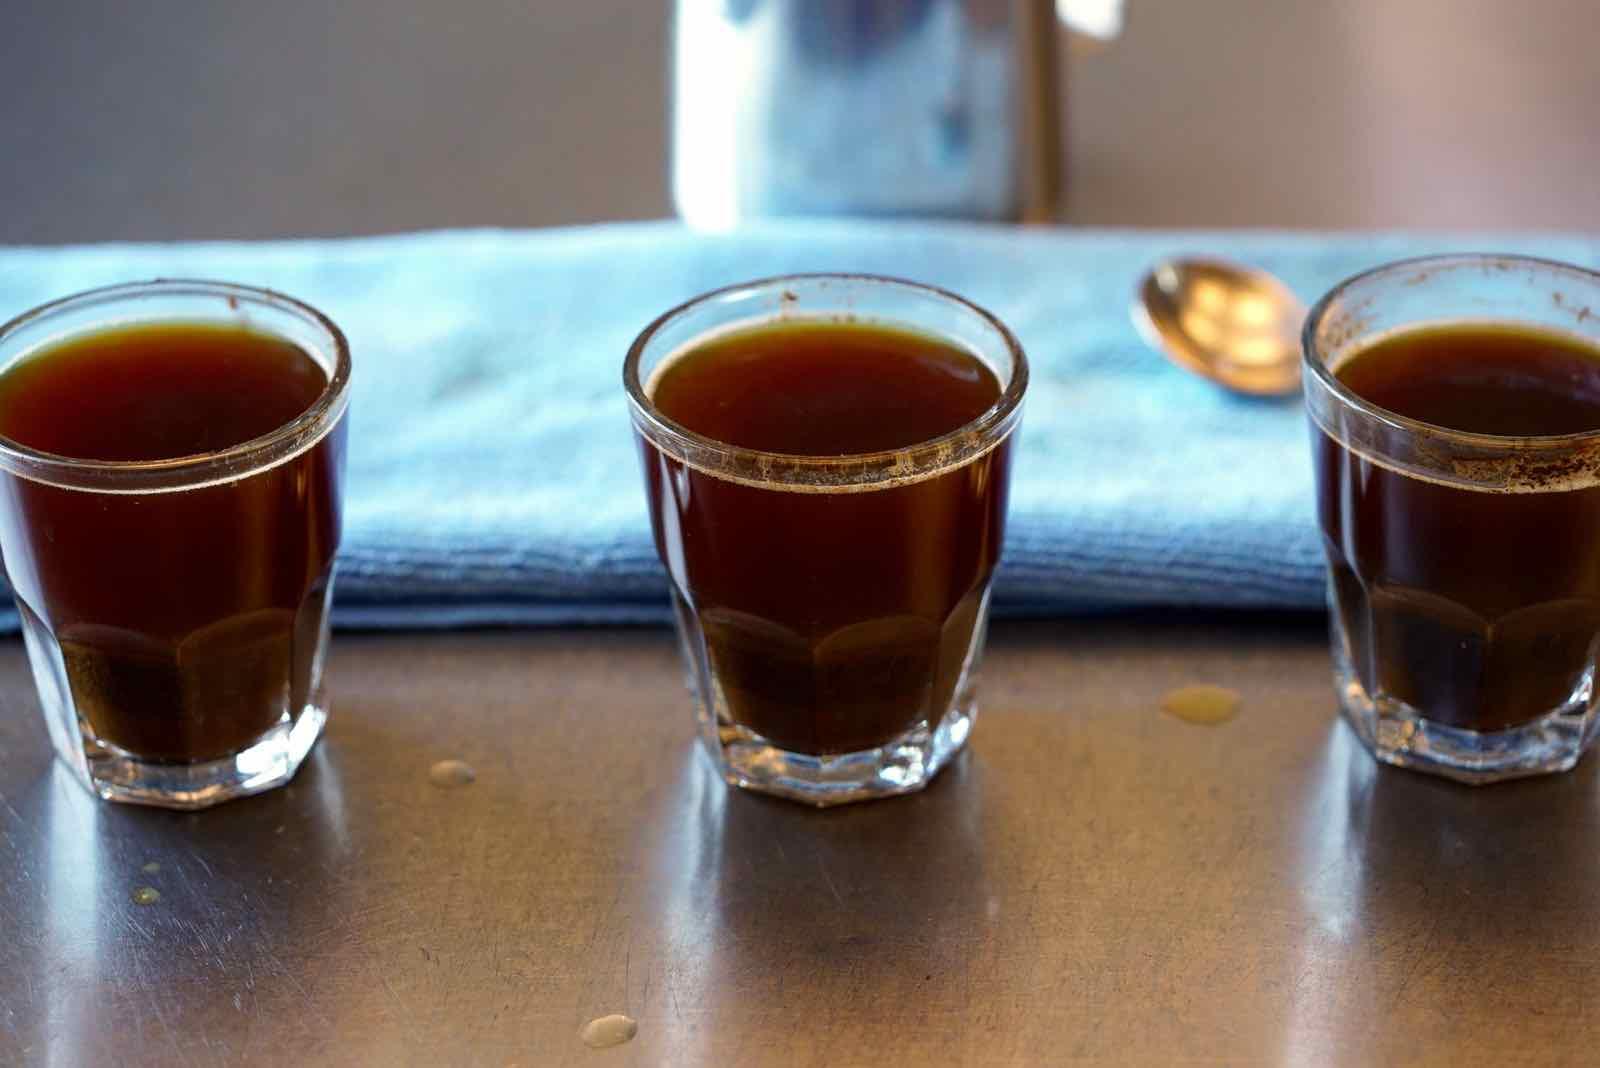 lamill-coffee-factory-tour-12.jpg